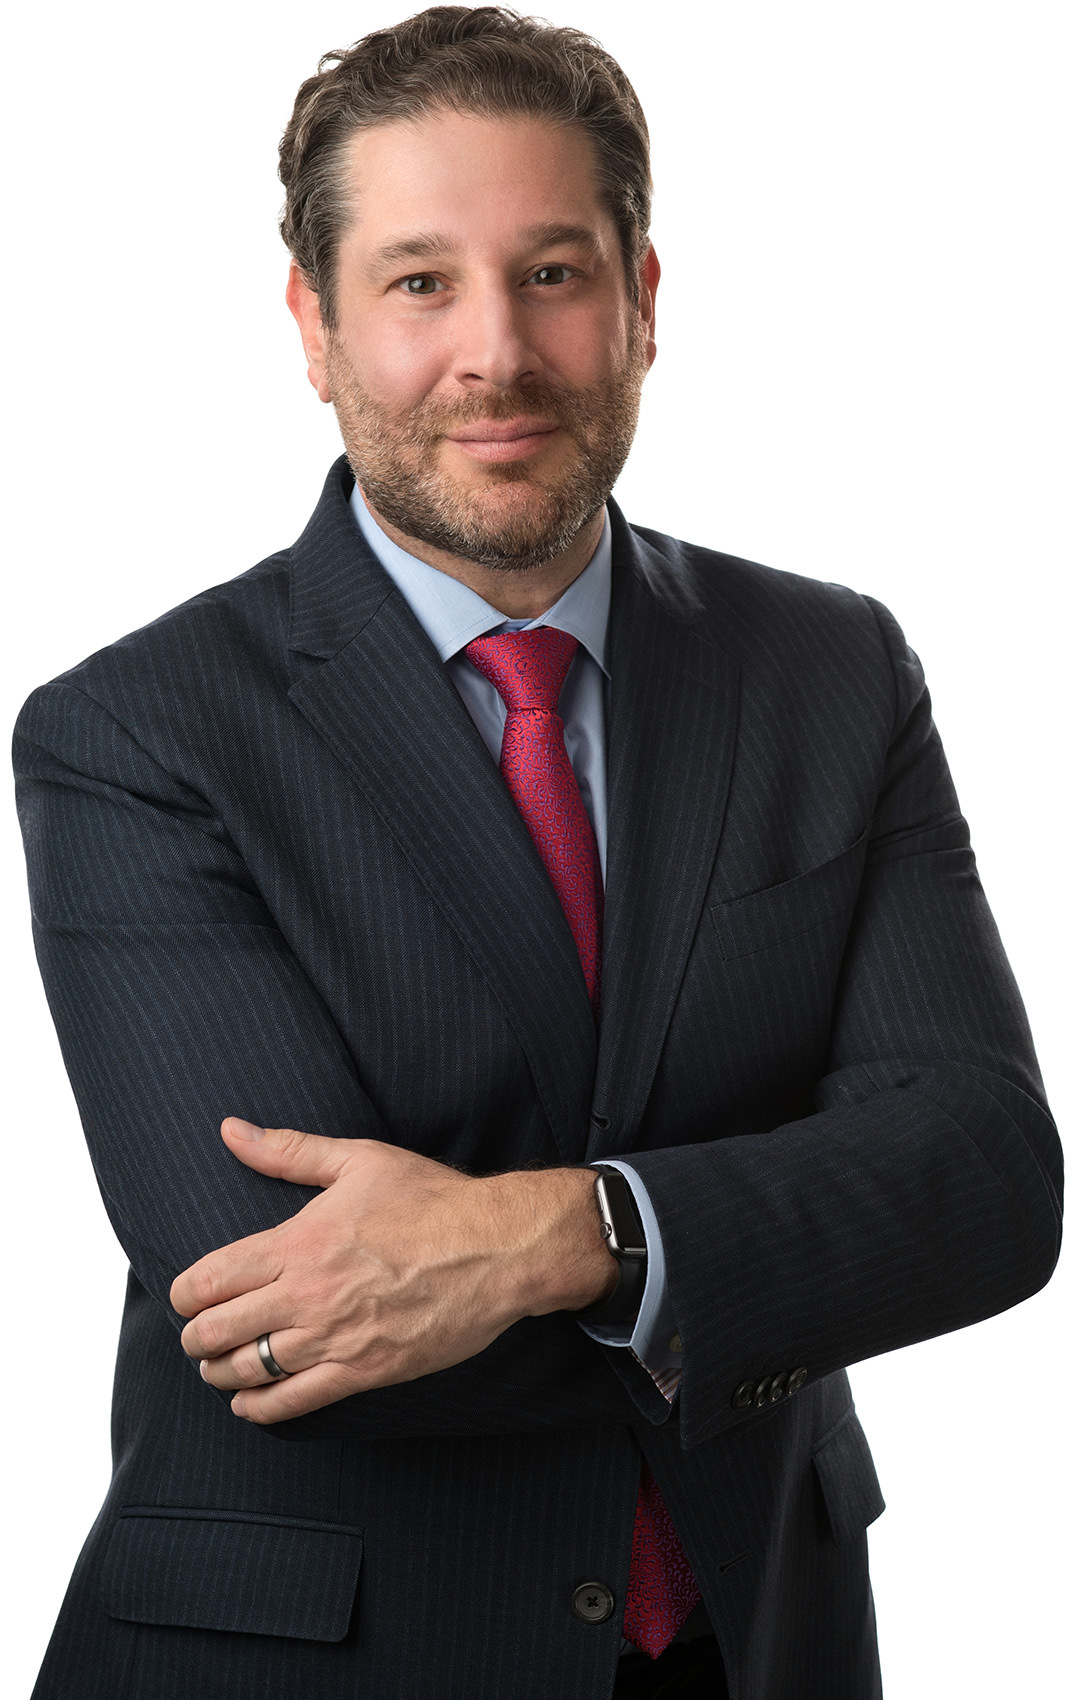 Scott R. Palmer